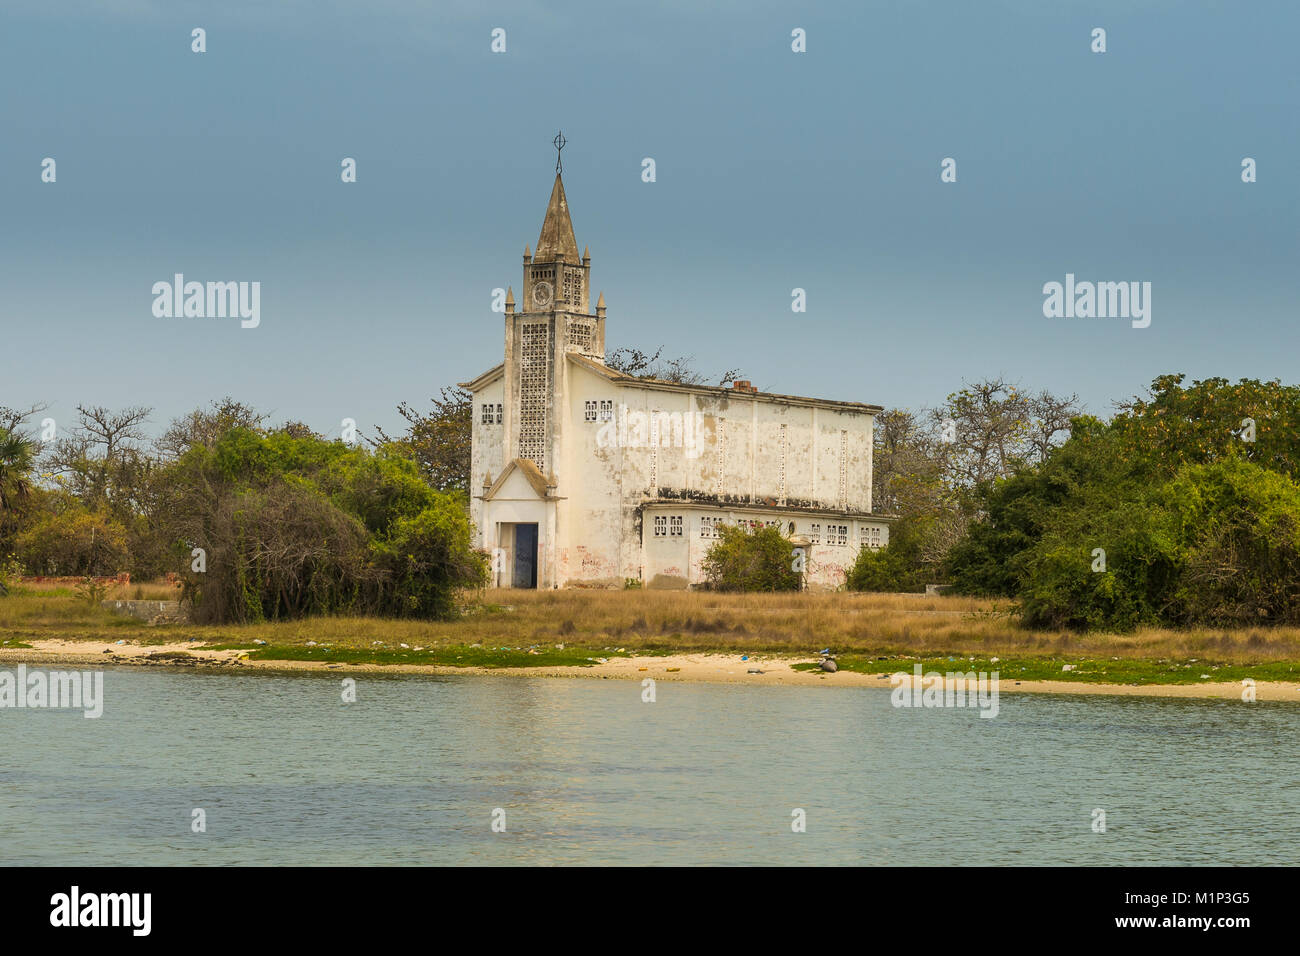 Church on Mussulo island, Luanda, Angola, Africa - Stock Image